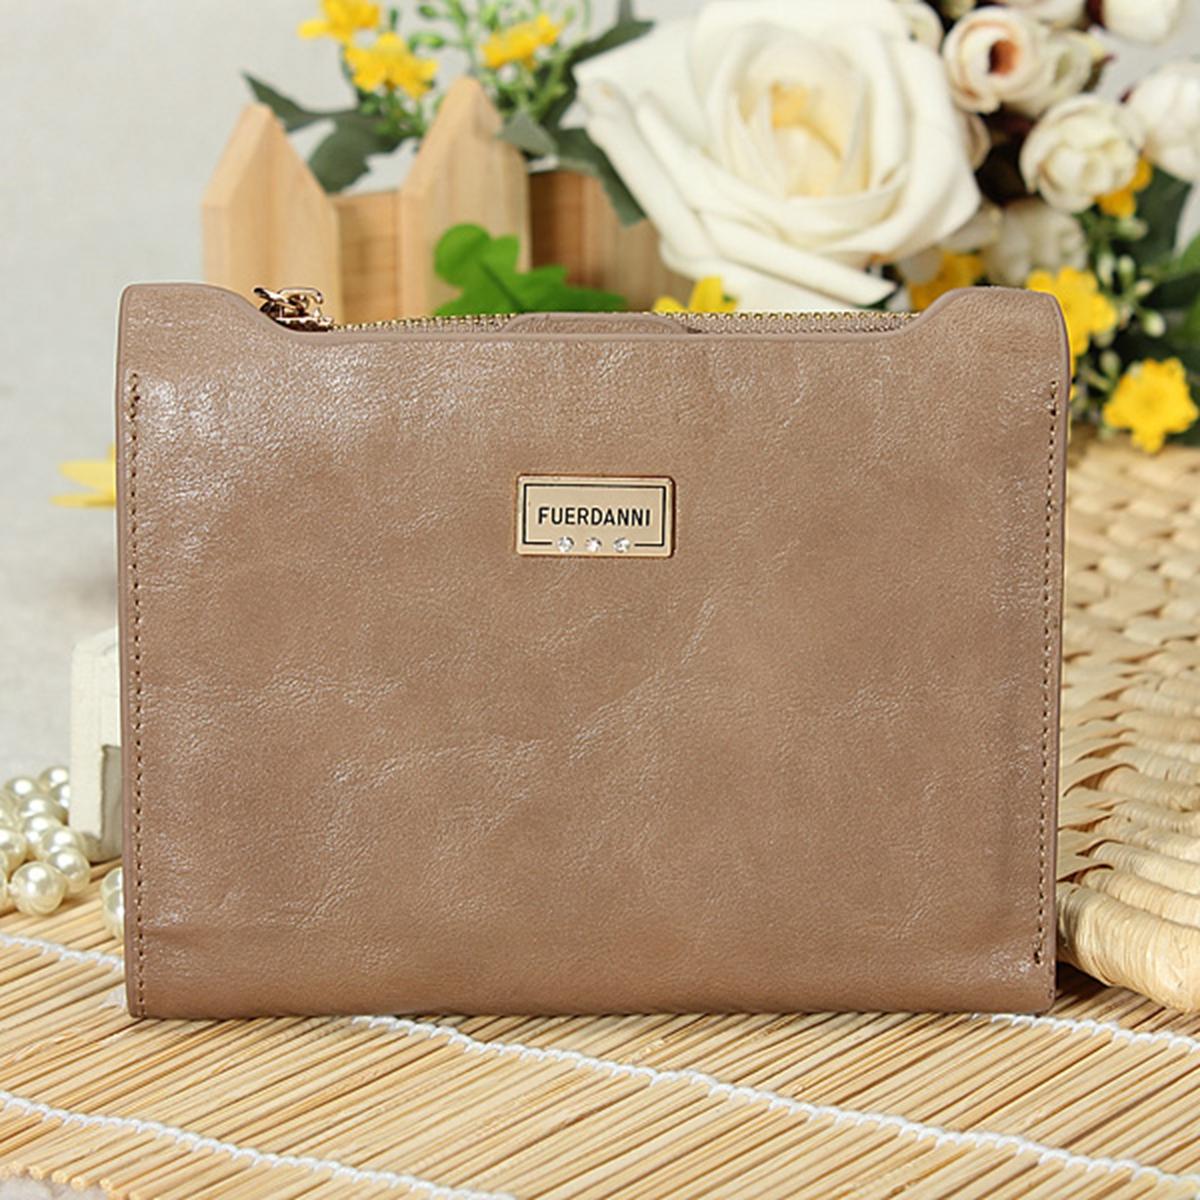 Women Soft Leather Clutch Wallet Bifold Card Holder Zip Purse Handbag Checkbook